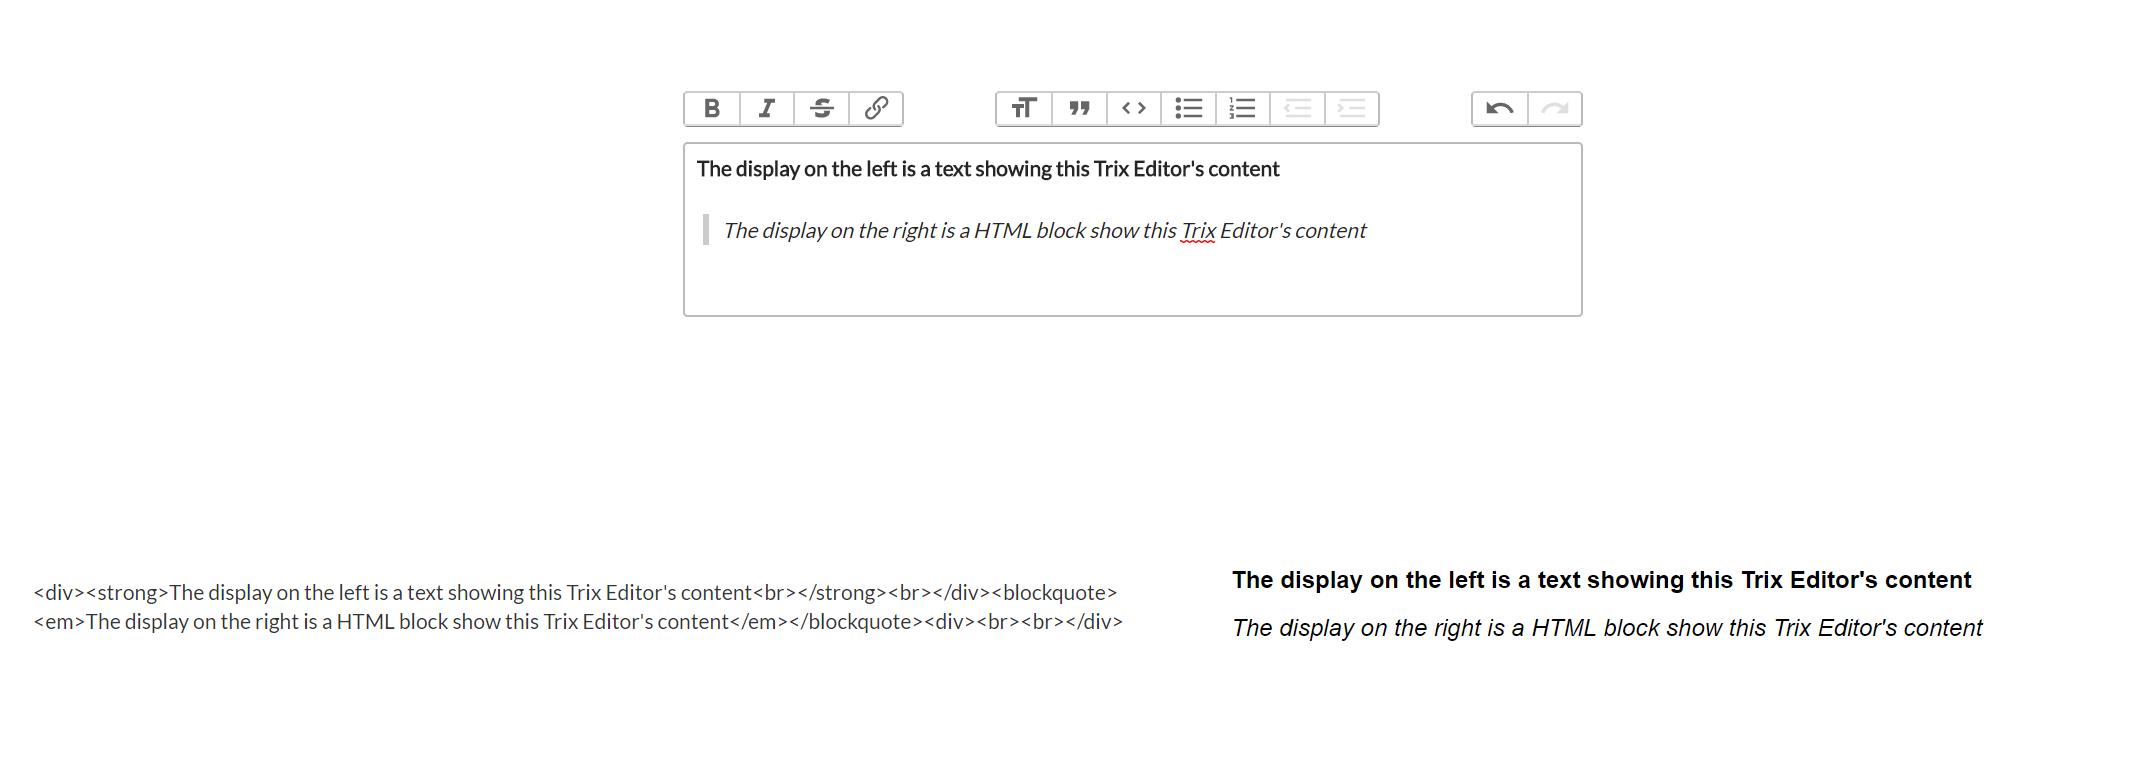 Free Plugin] Trix Rich Text Editor - Showcase - Bubble Forum